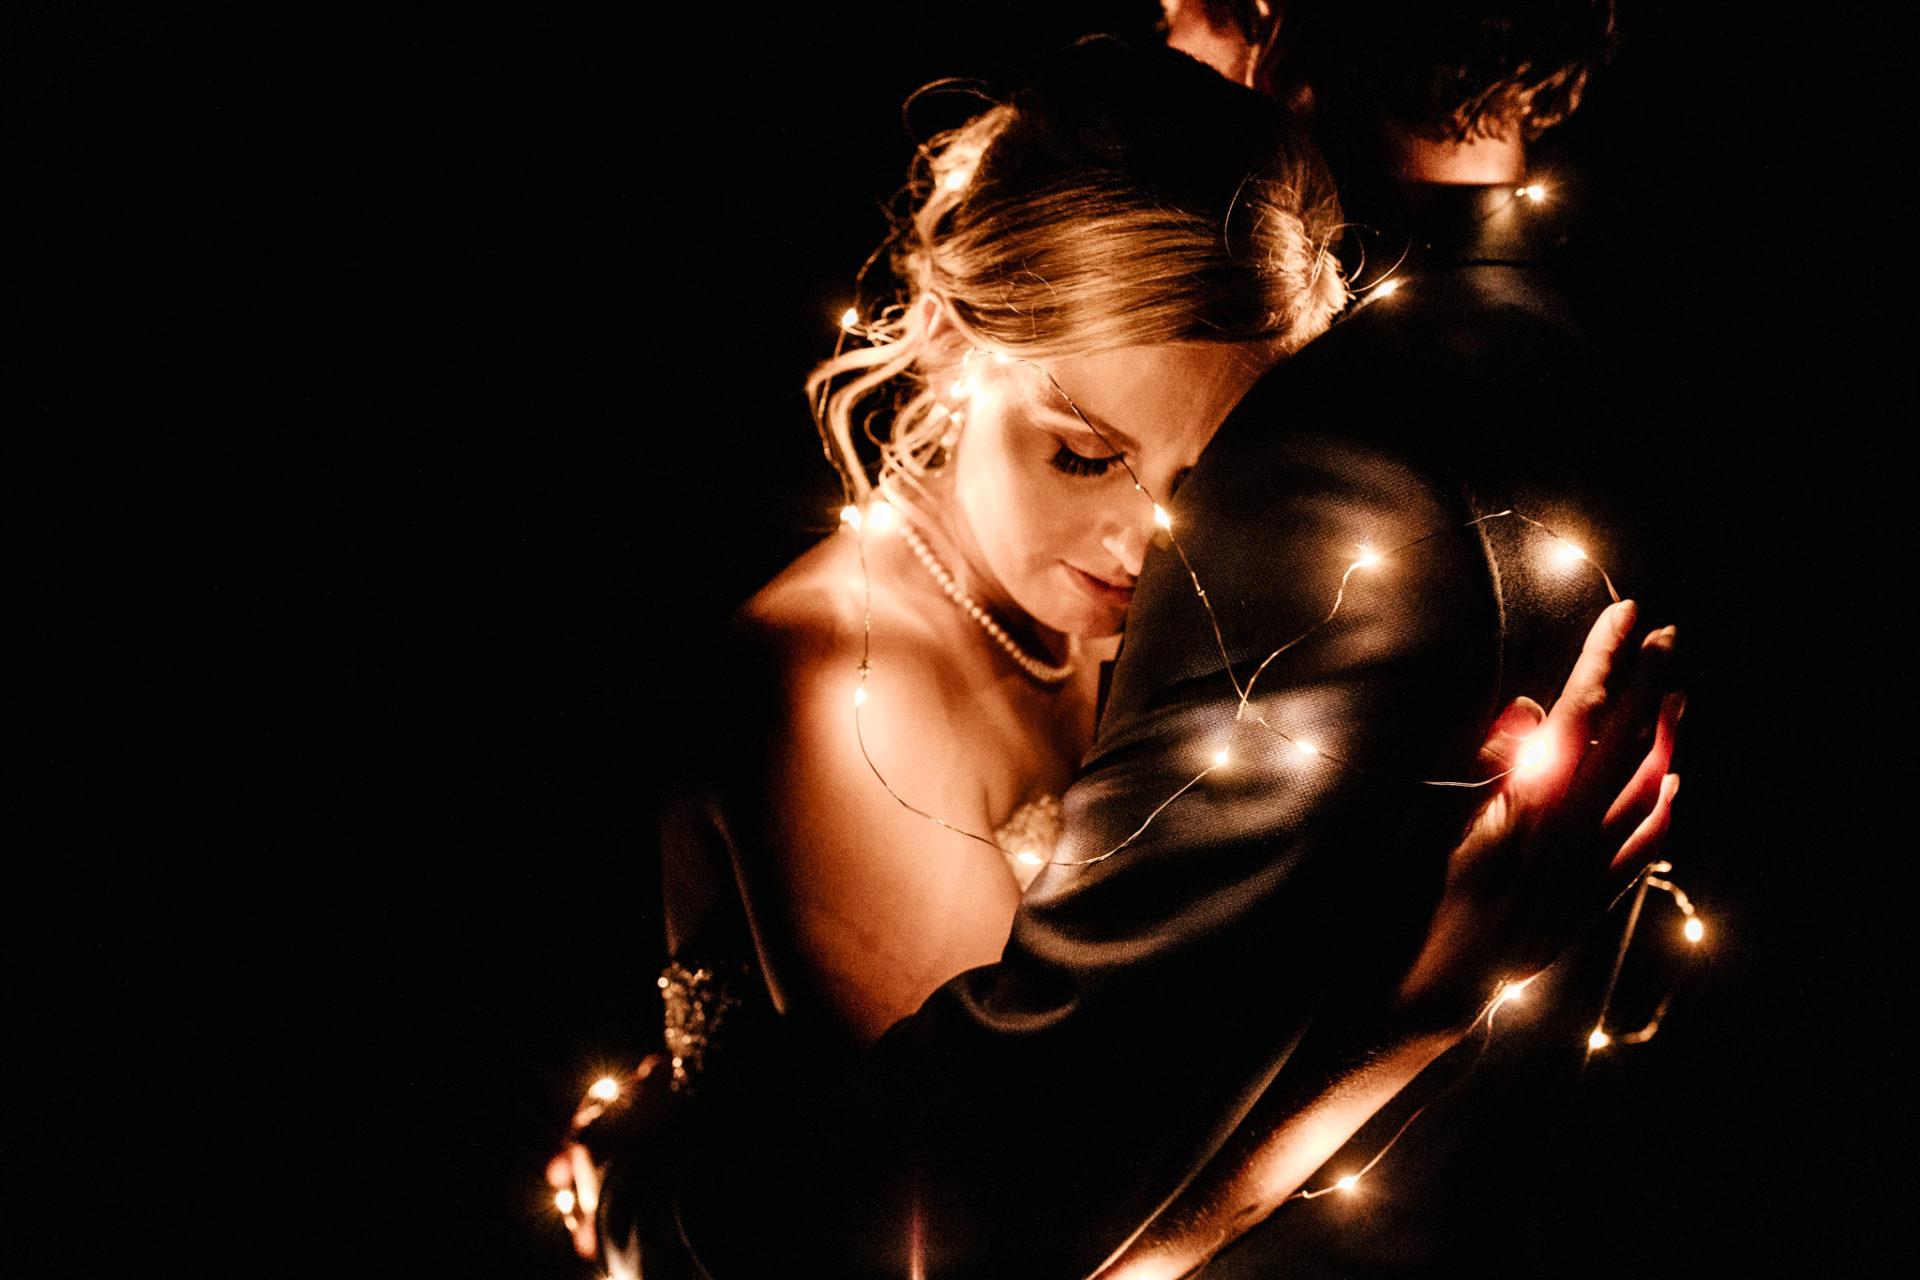 backyard-wedding-australia-melbourne-bride-night-portrait-bride-and-groom-with-fairy-lights